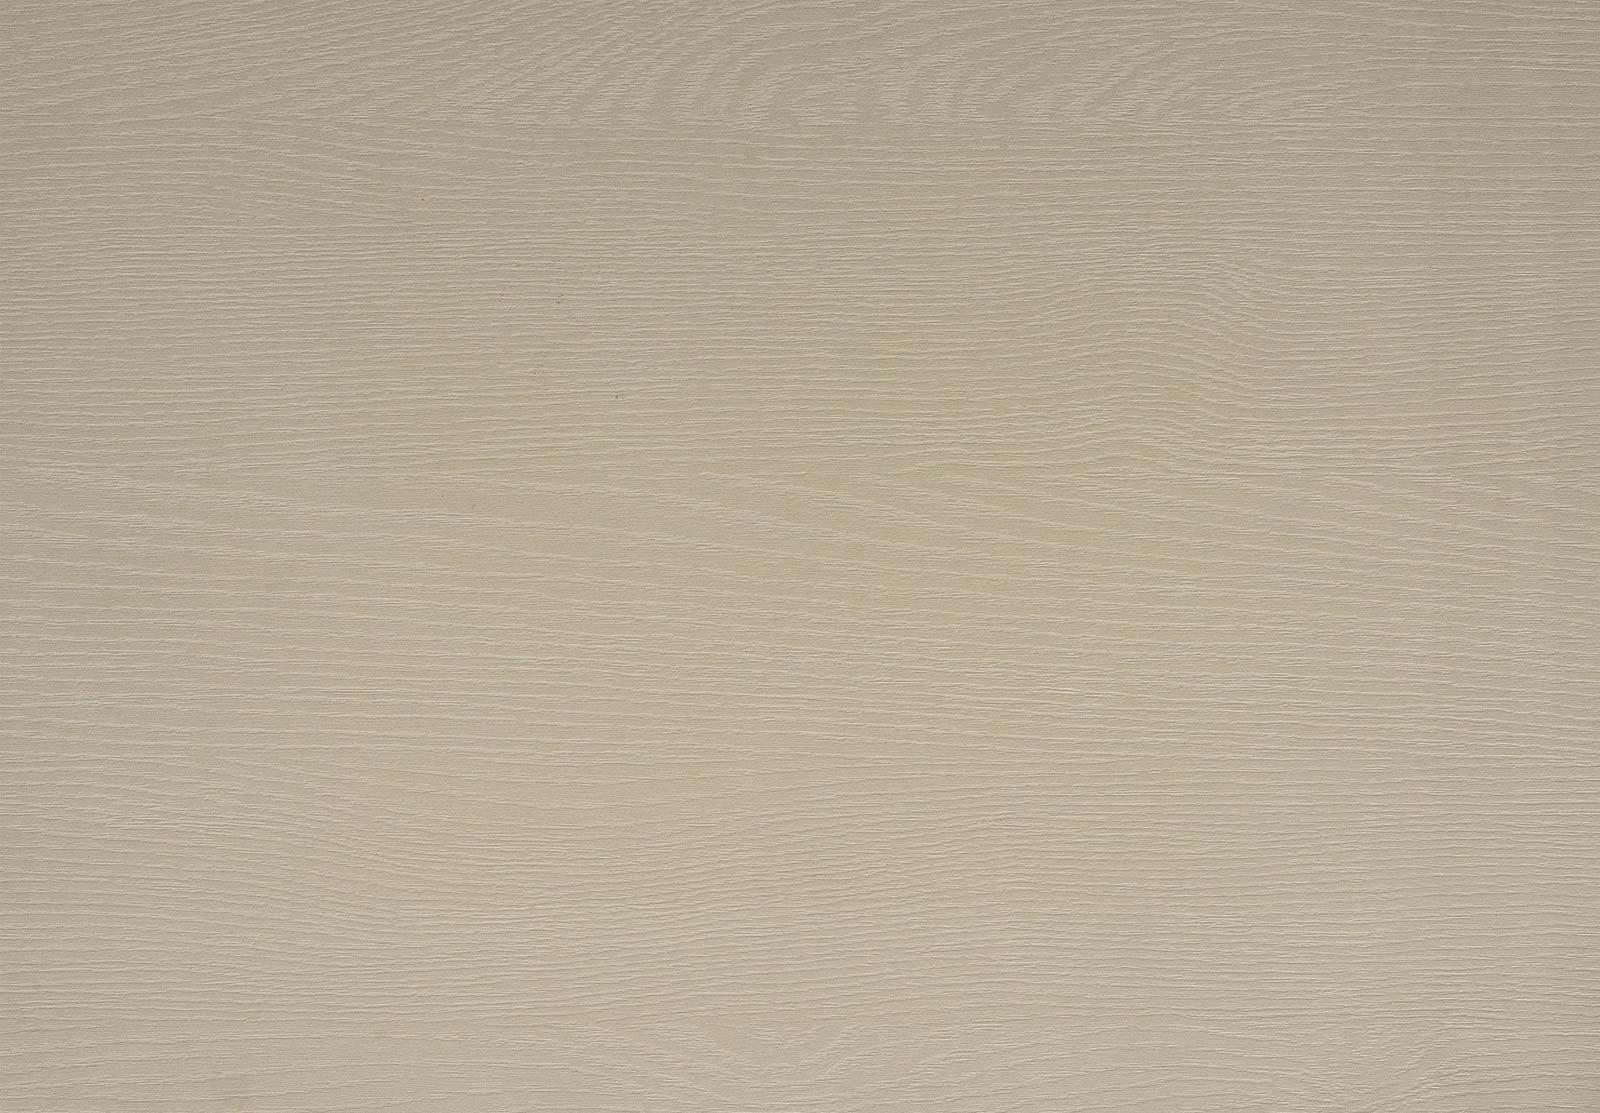 Pannelli alfawood - Lapis 0494